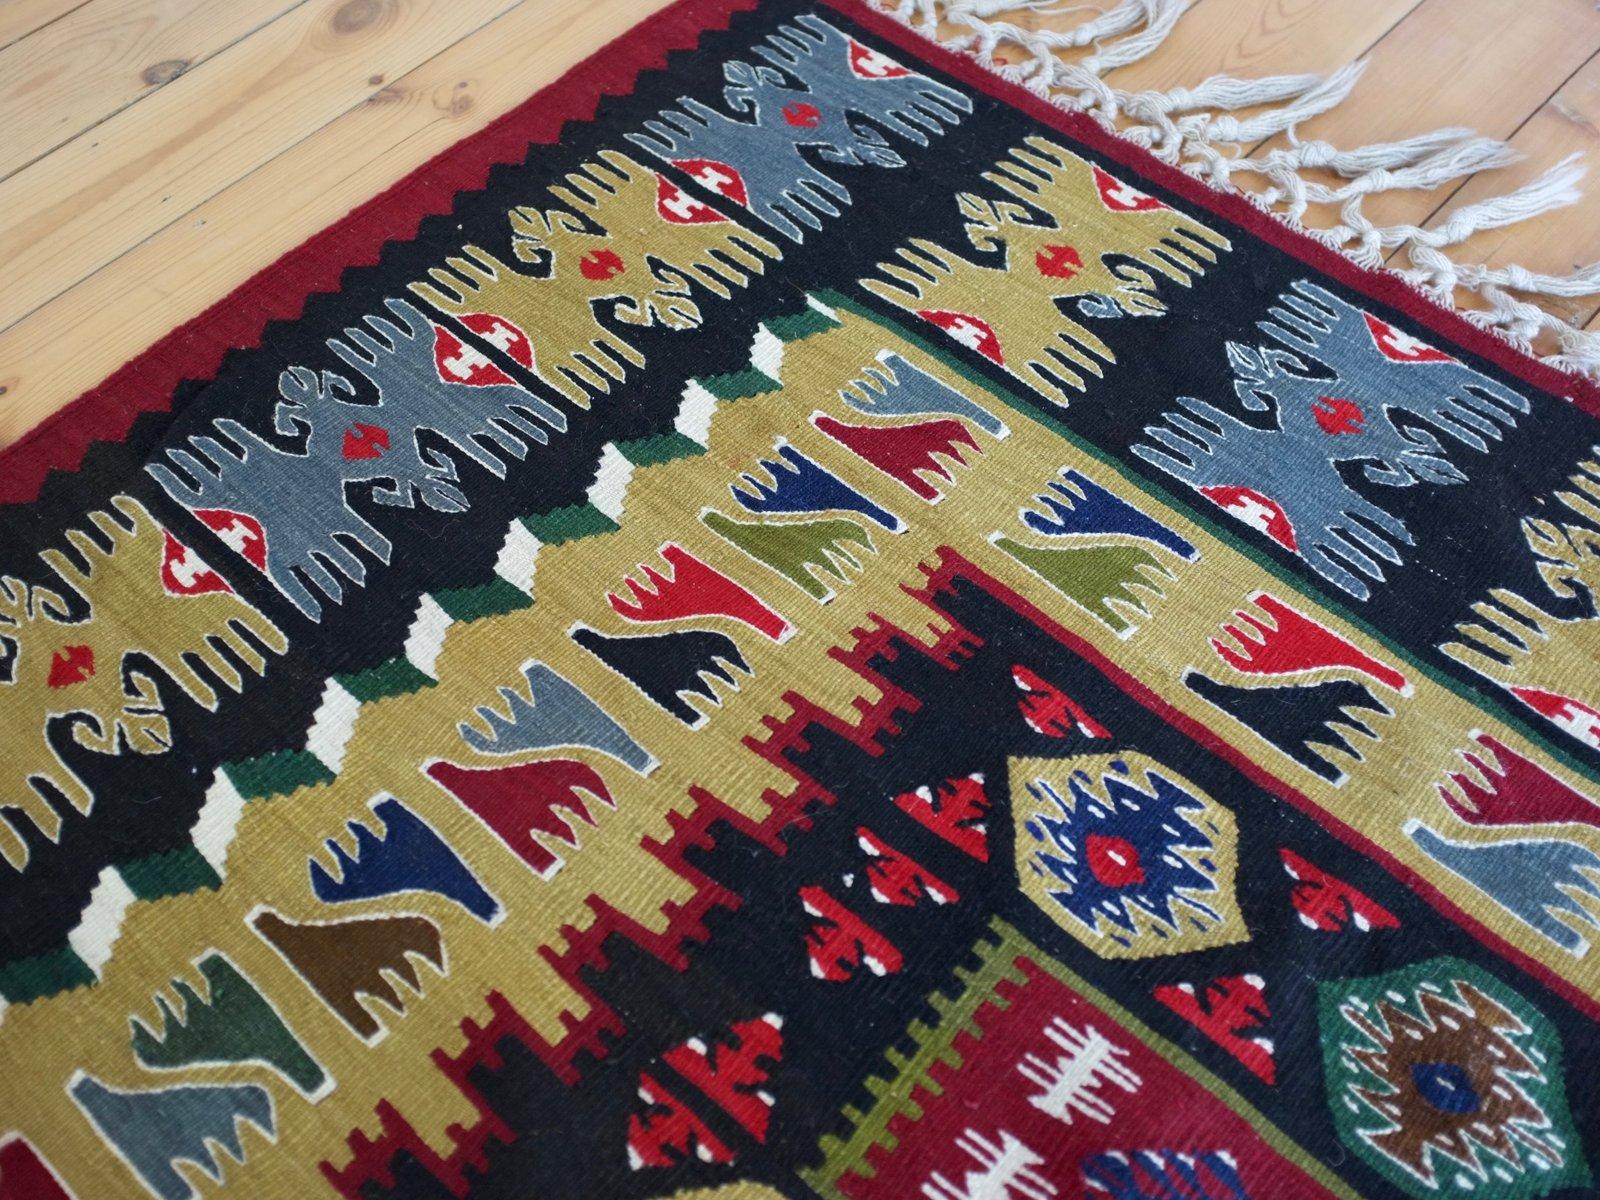 turkish handwoven sarkoy yoruks kilim rug 1950s for sale at pamono. Black Bedroom Furniture Sets. Home Design Ideas